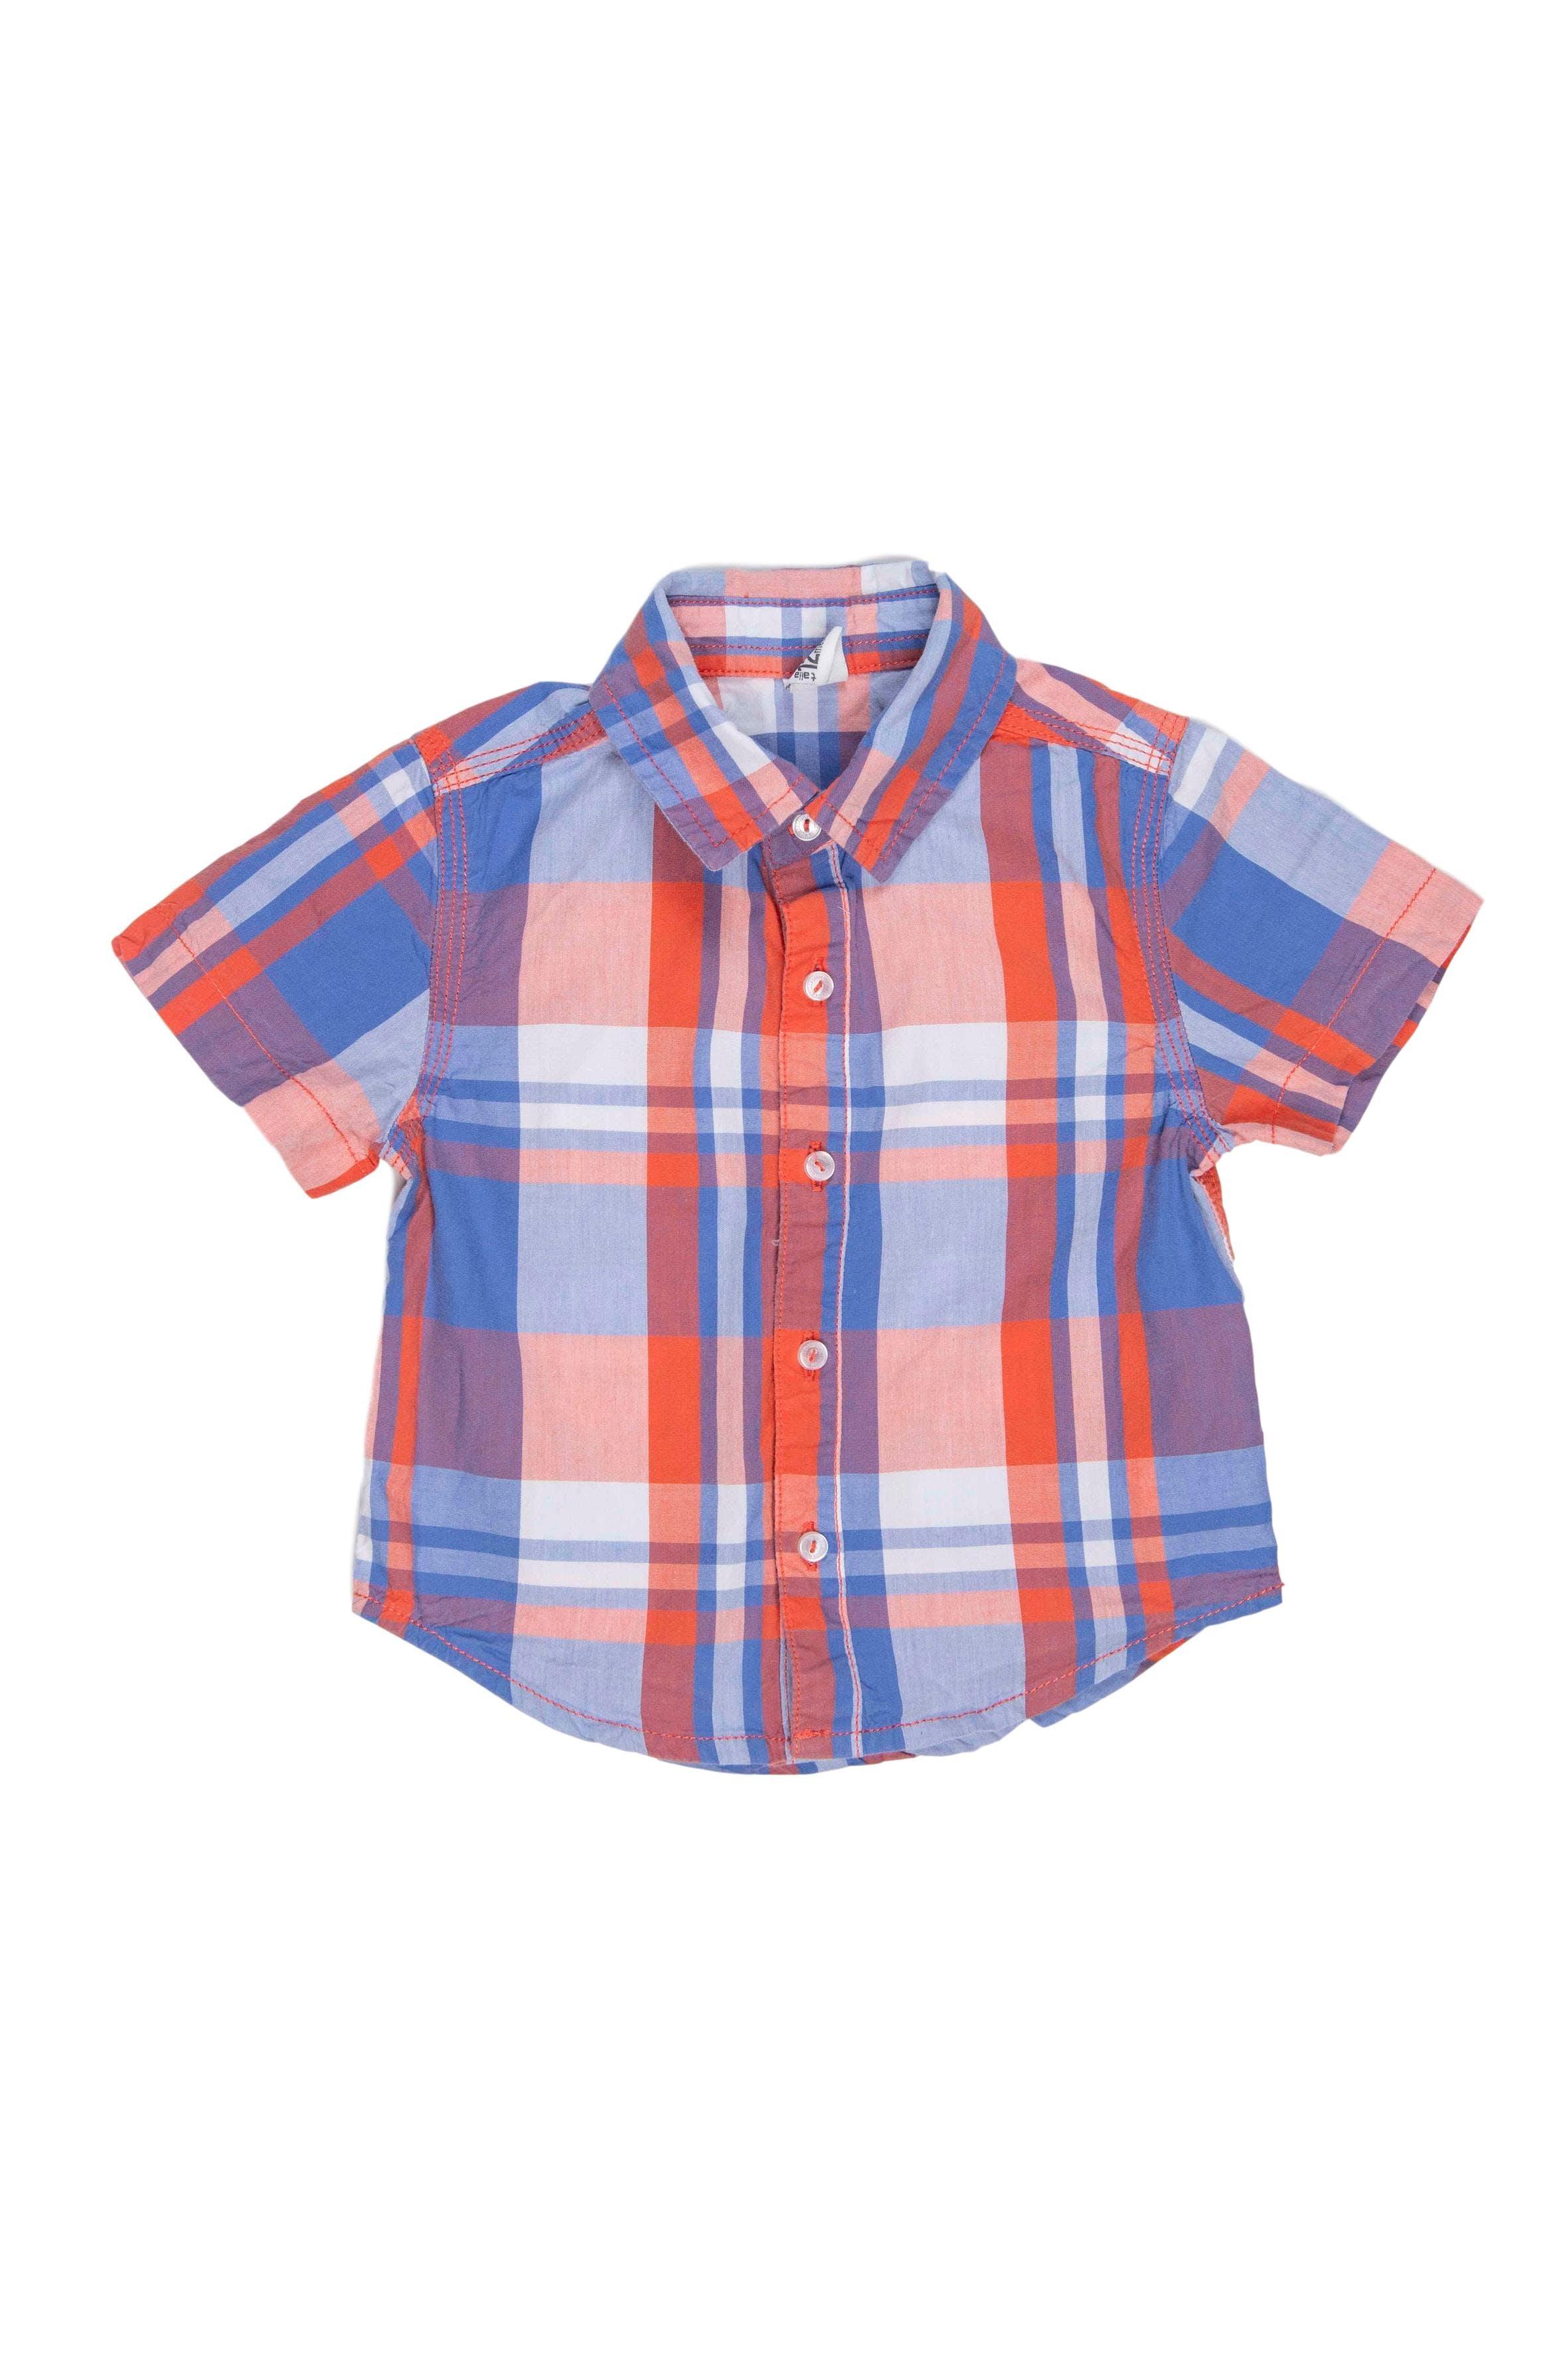 Camisa manga corta cuadros azul y anaranjados, 100% algodón - Yamp